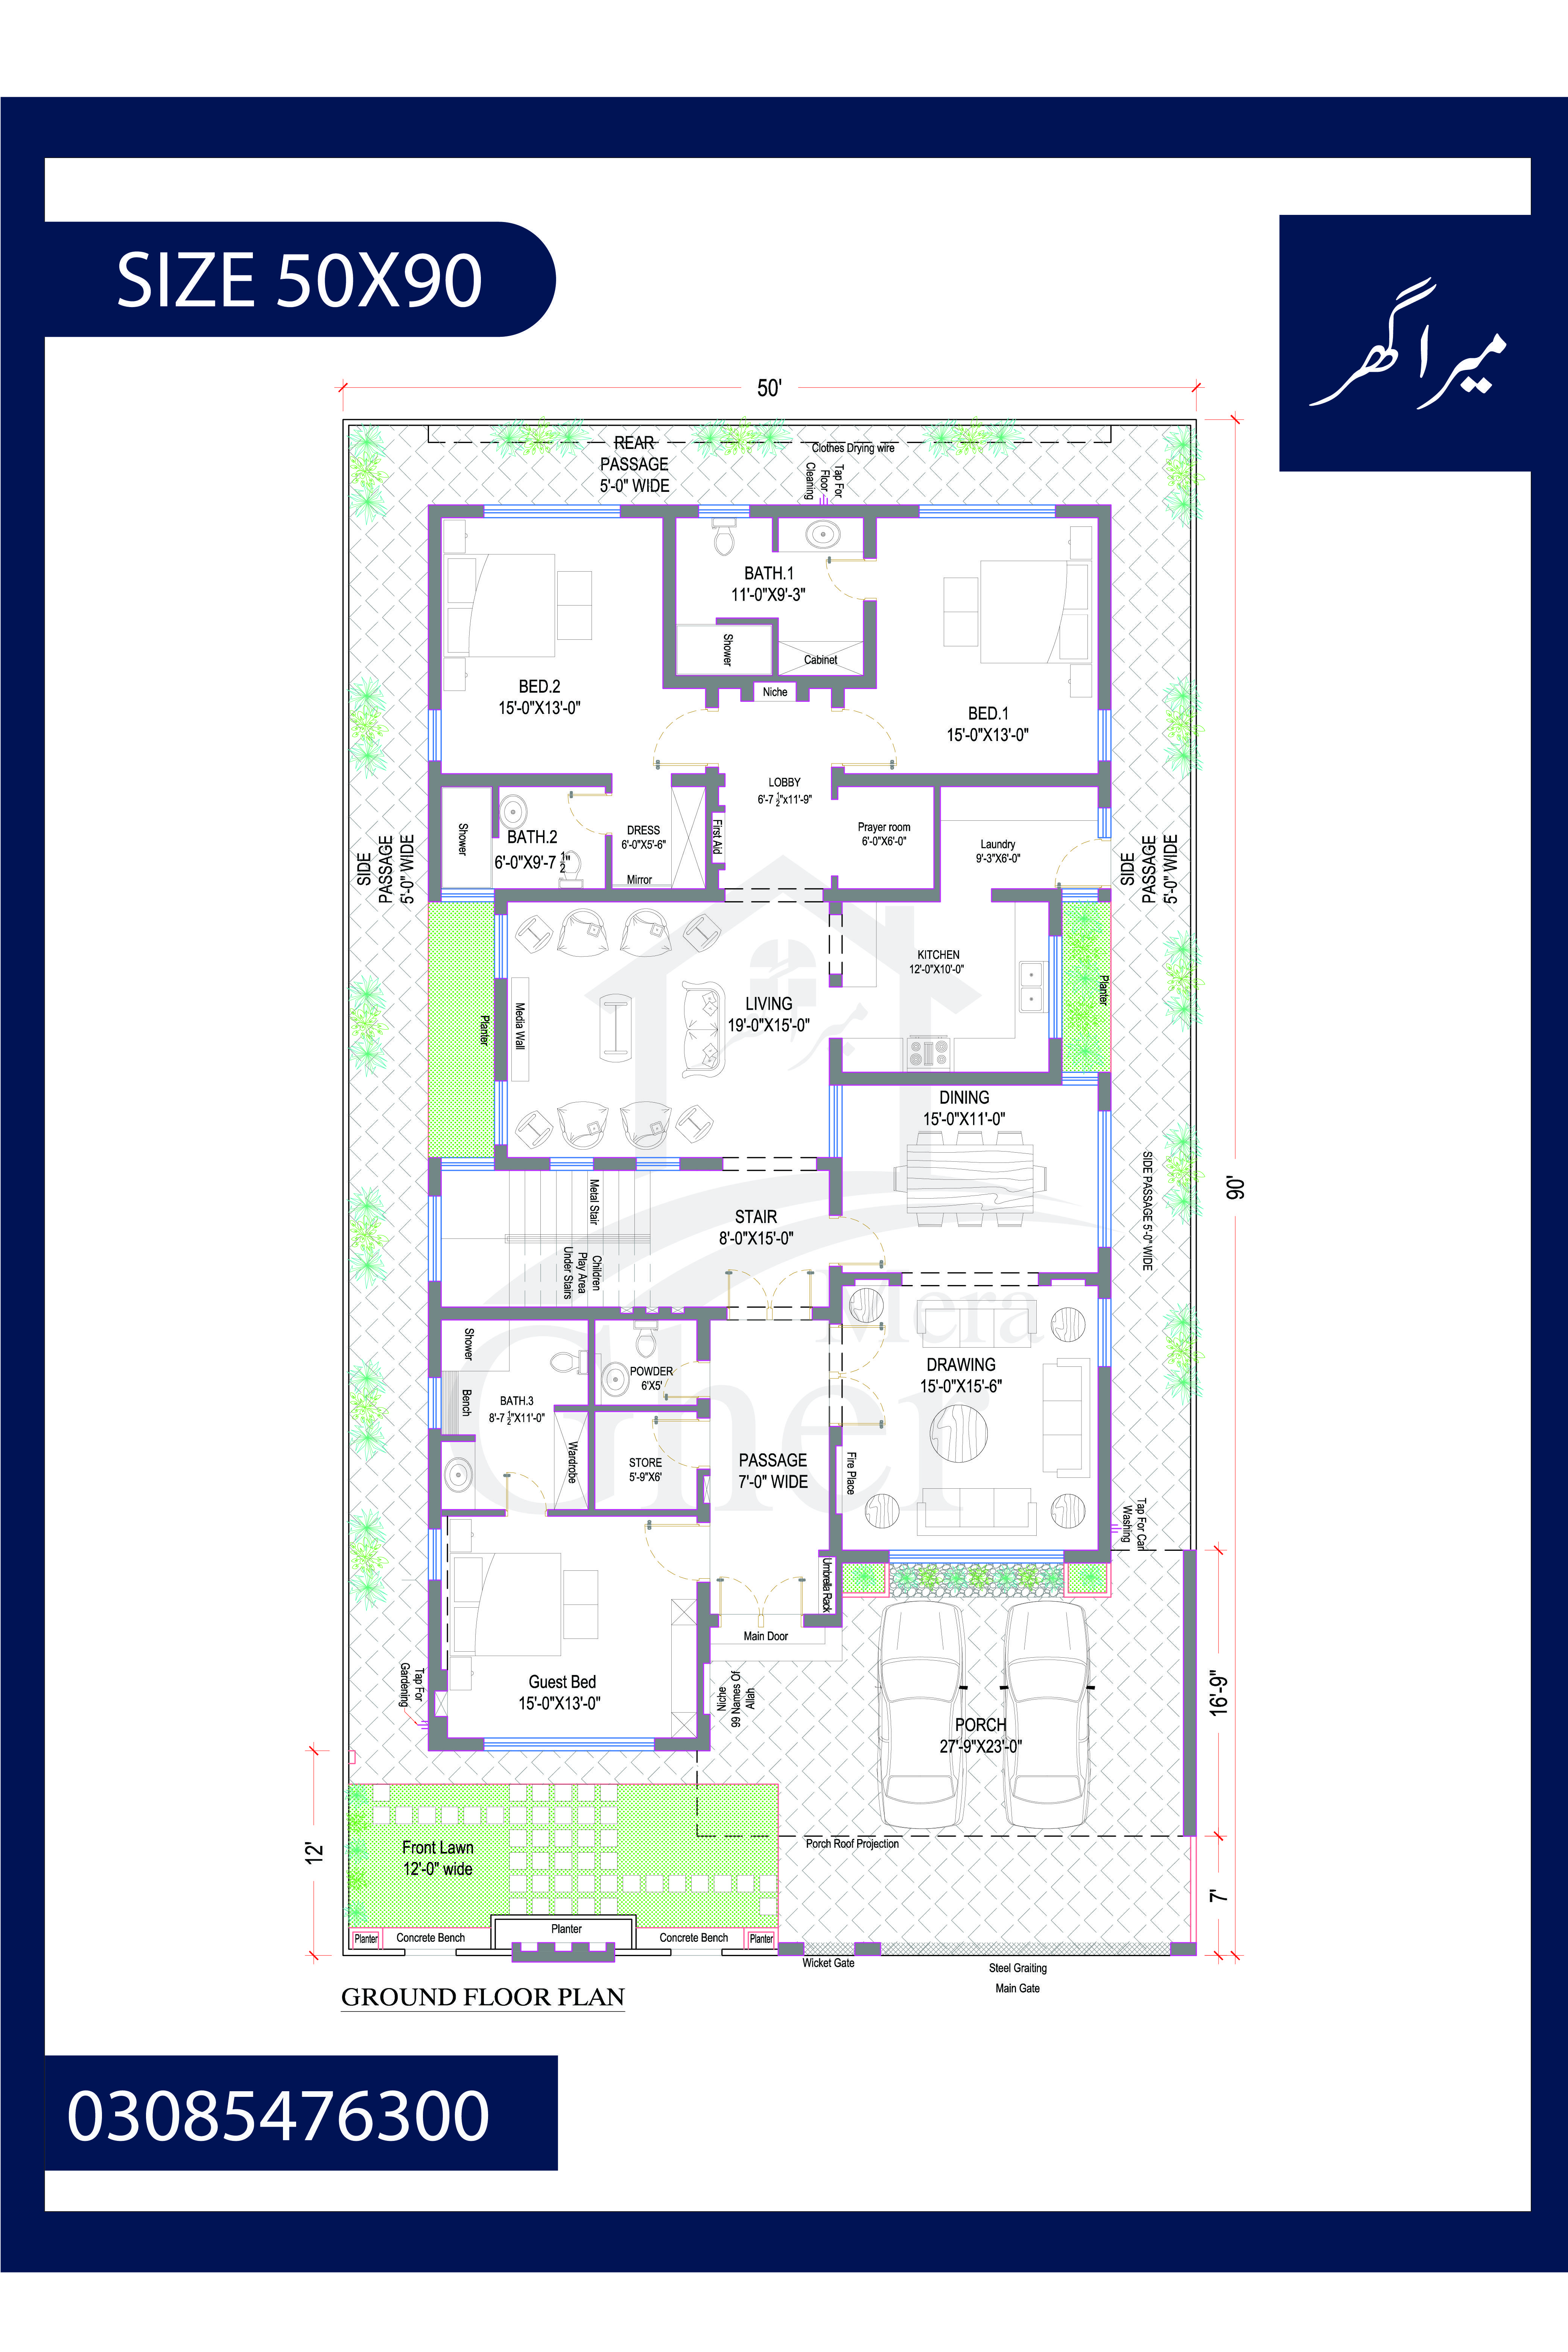 1 Kanal house in 2020 10 marla house plan, House plans